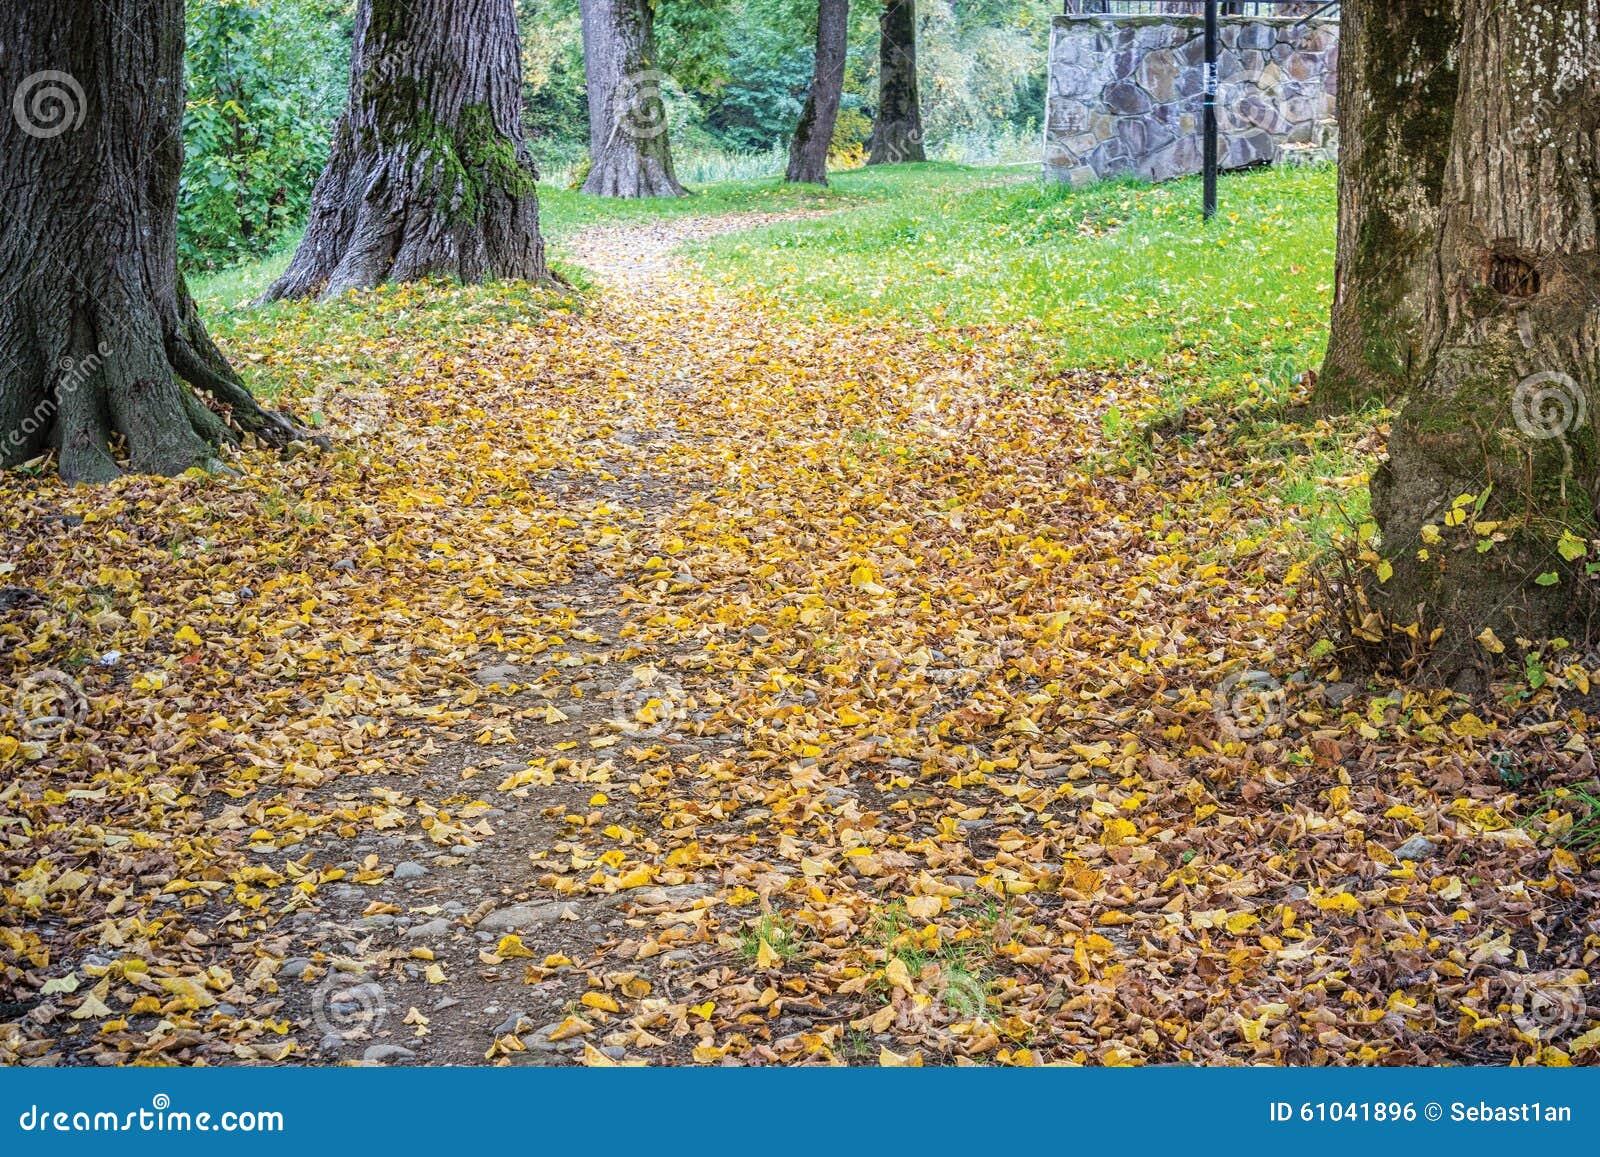 tree path track leaves - photo #41